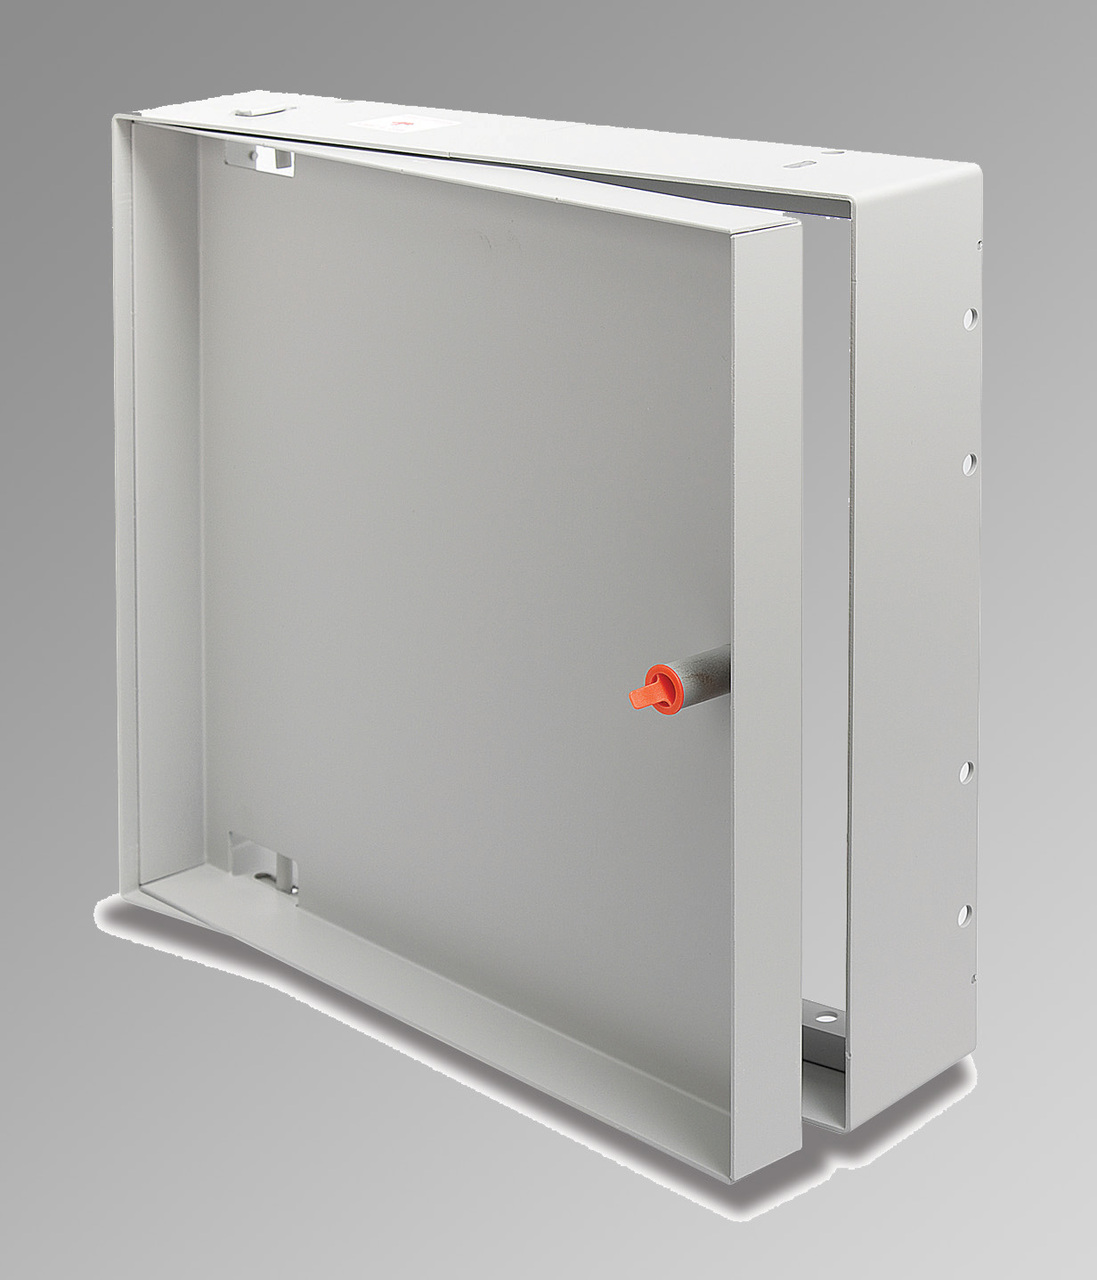 "12"" x 12"" Recessed Access Door with Pin Hinge & No Flange - Acudor"